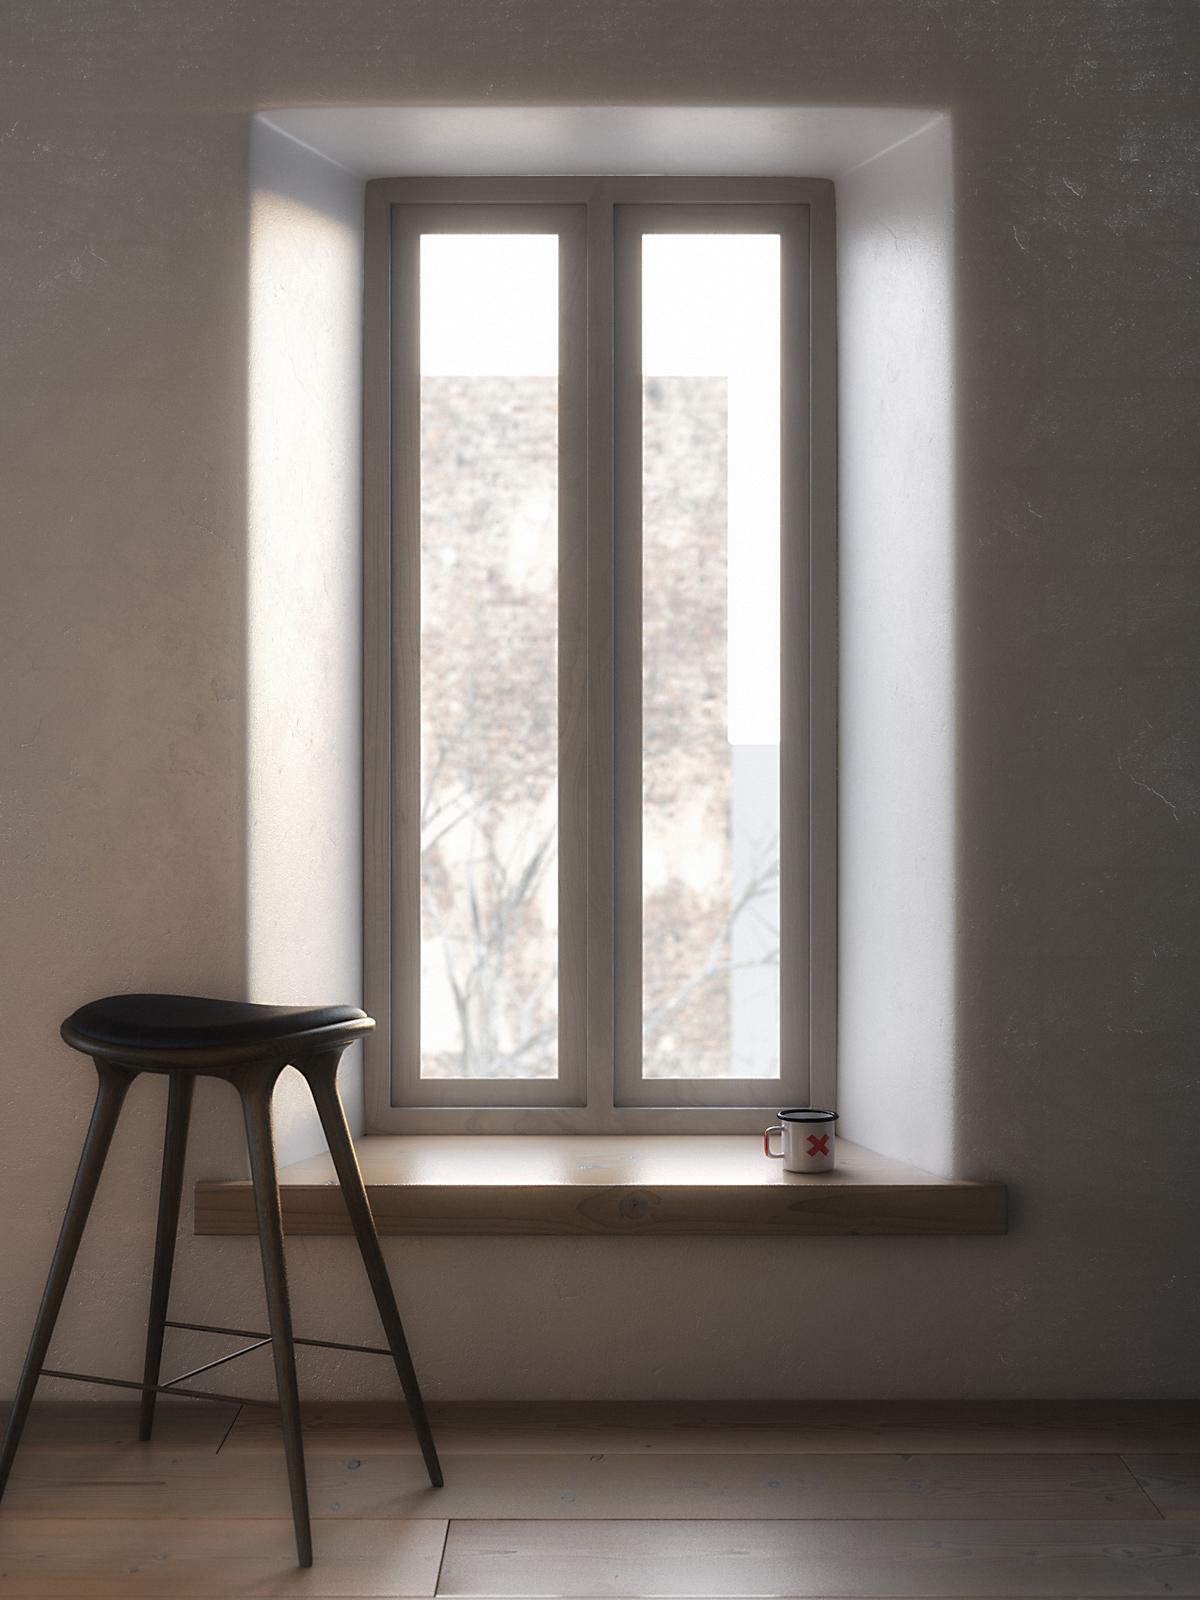 140309_windowdraft2k.jpg